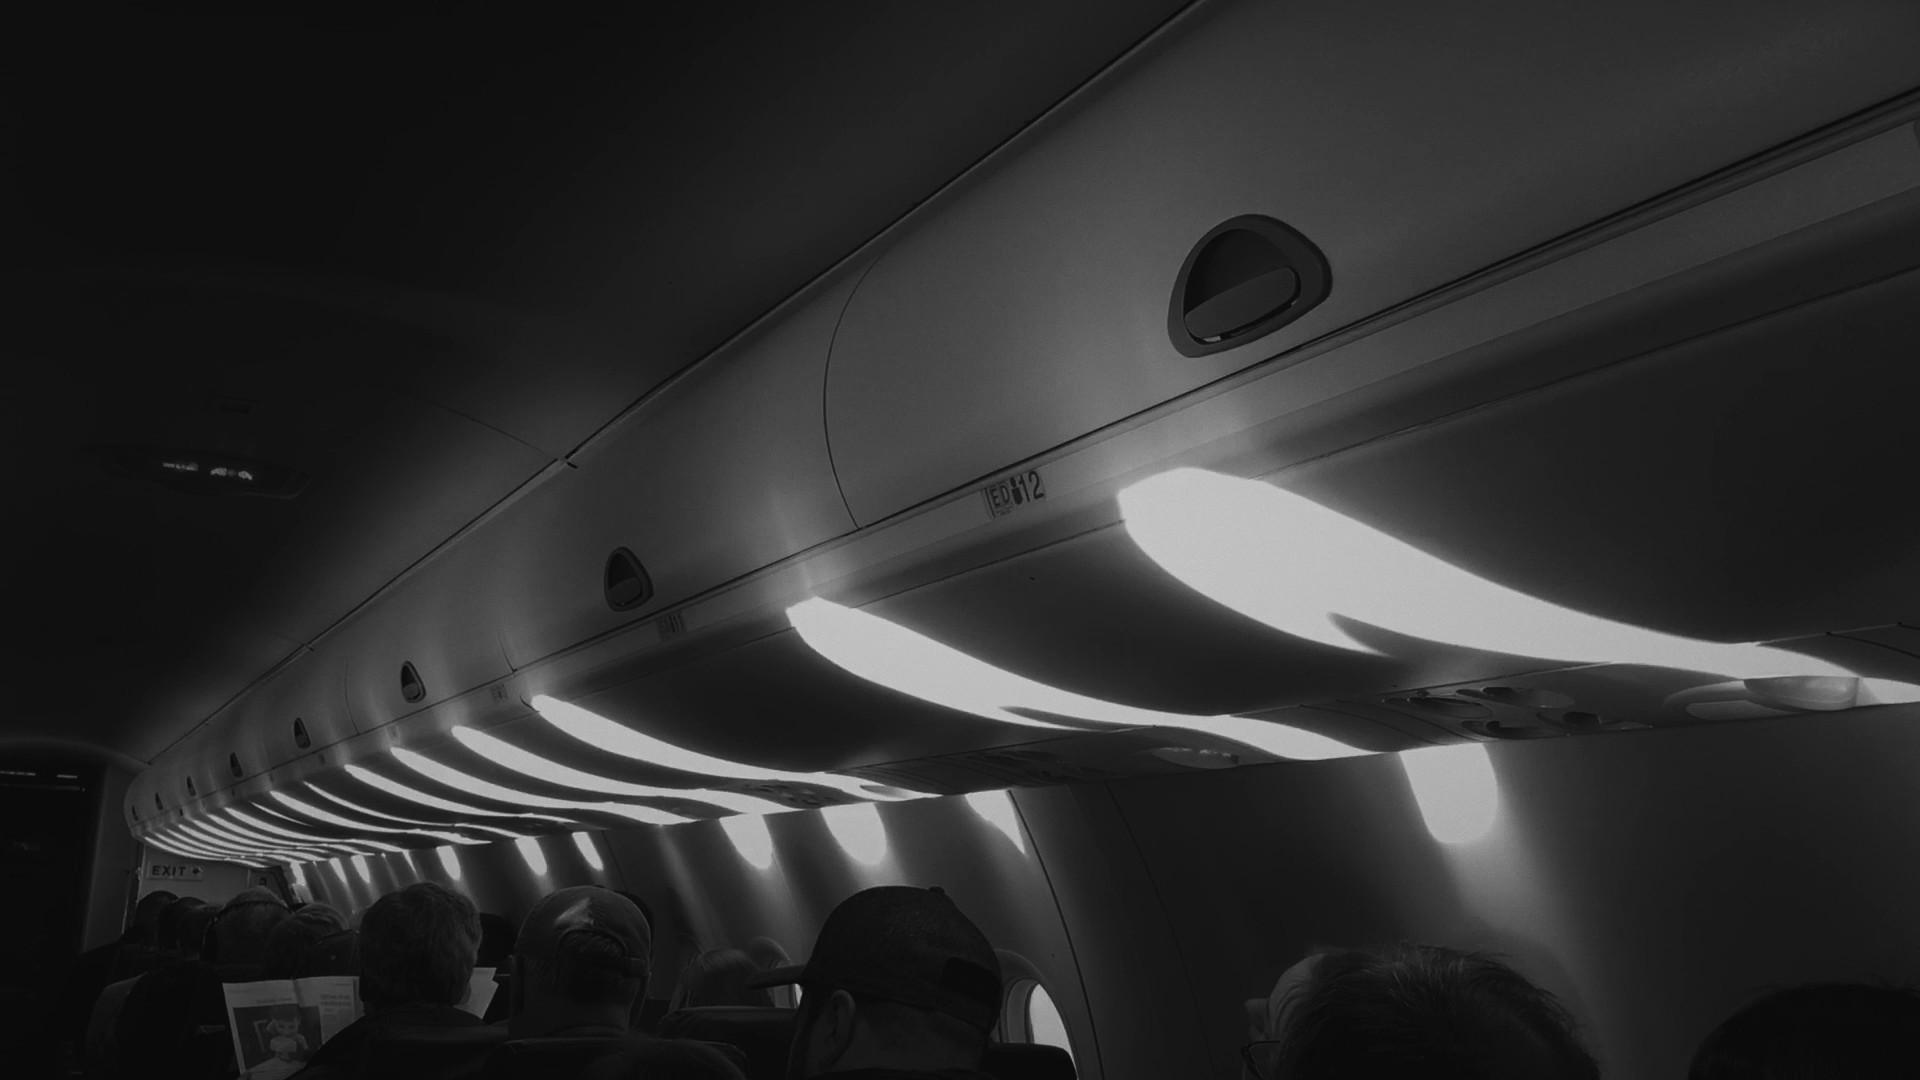 In Plane English